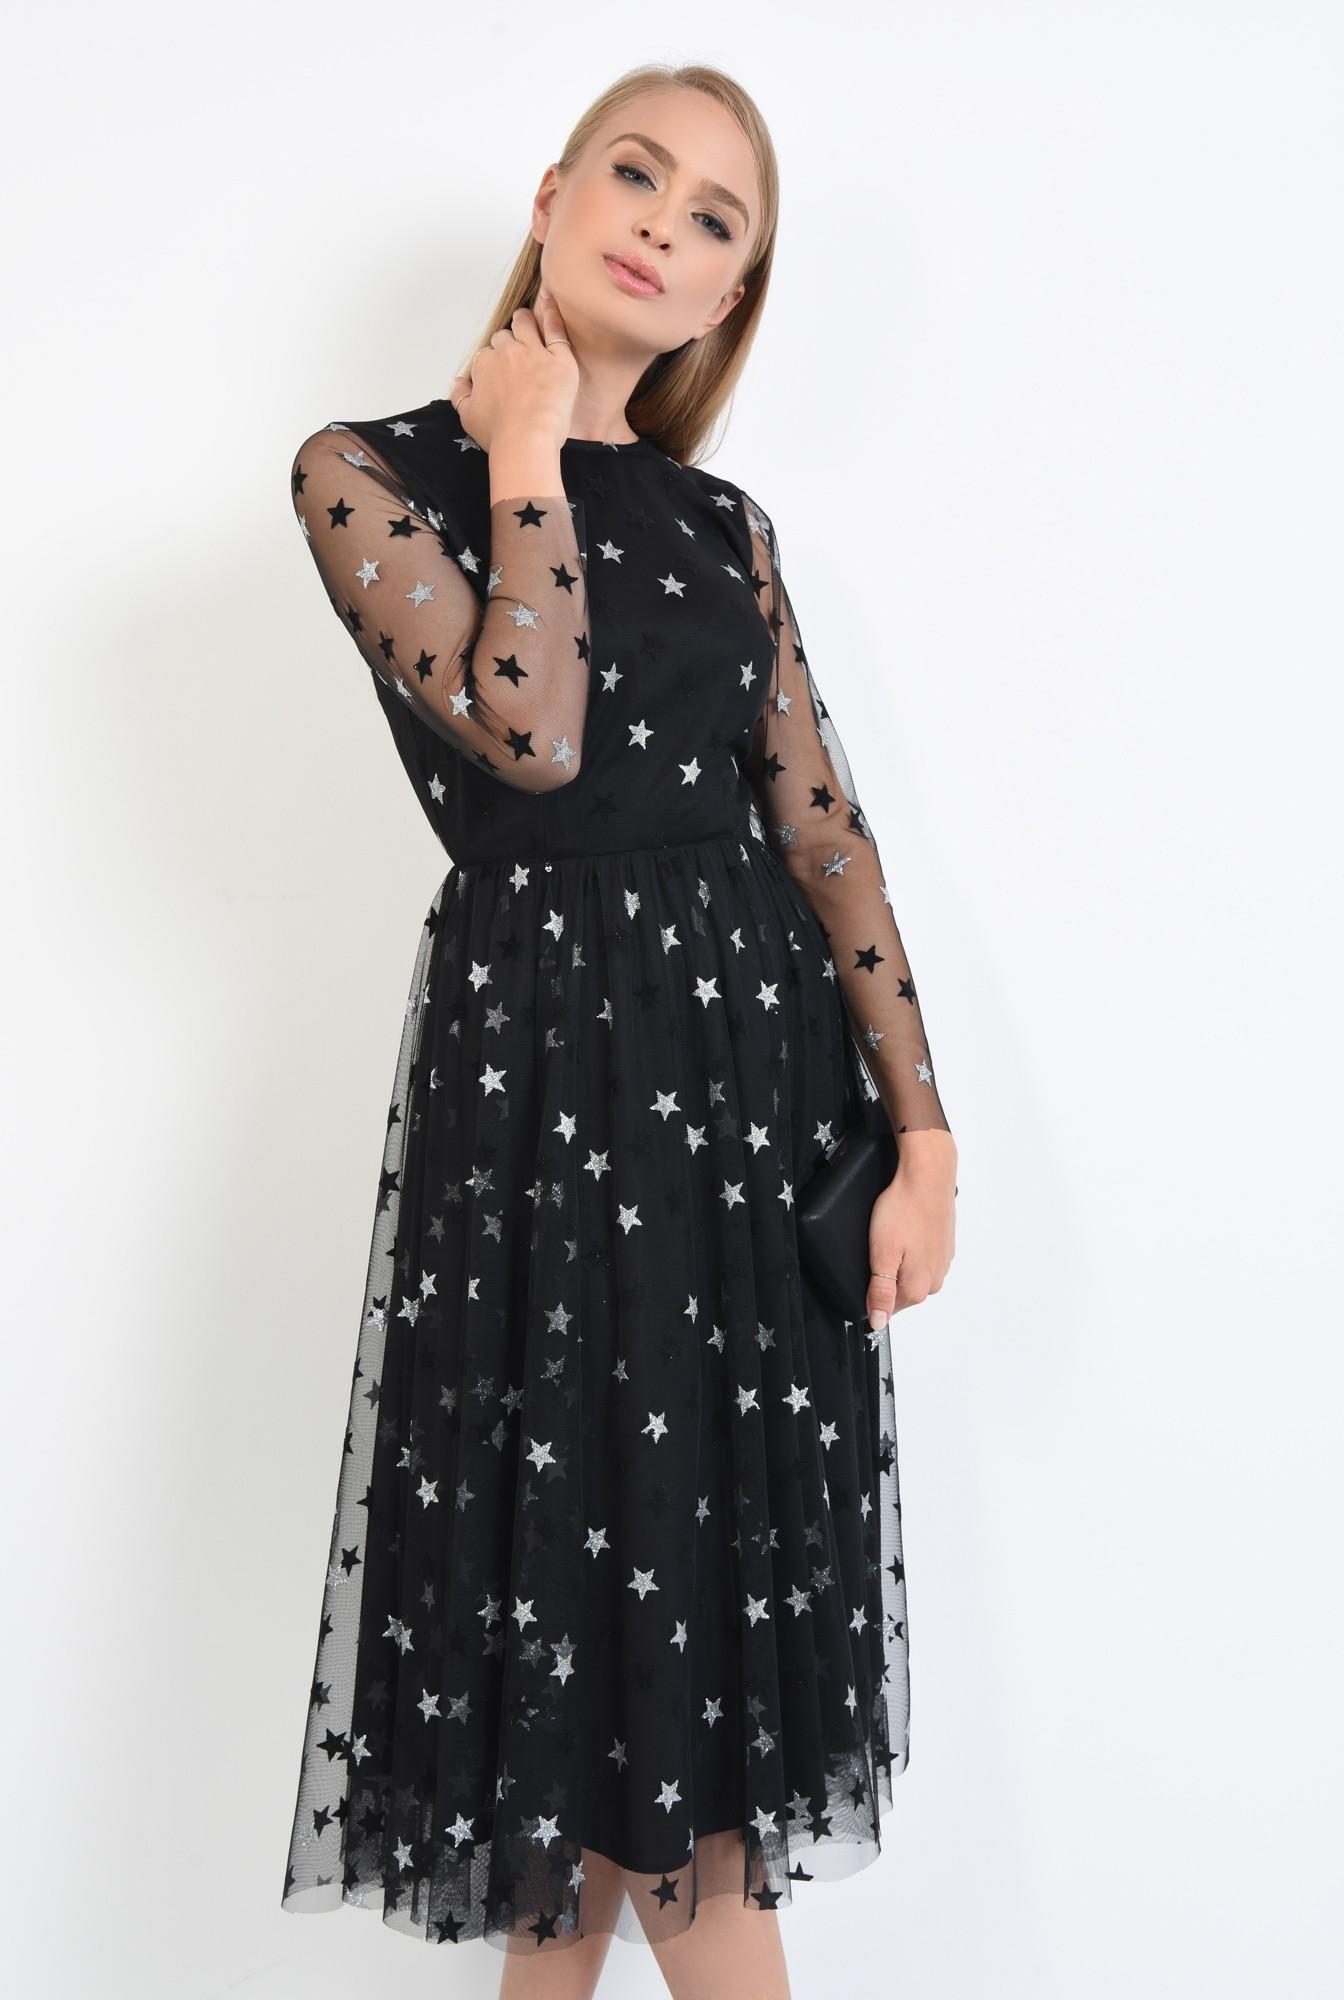 2 - 360 - rochie neagra, croi evazat, cusatura in talie, maneci lungi